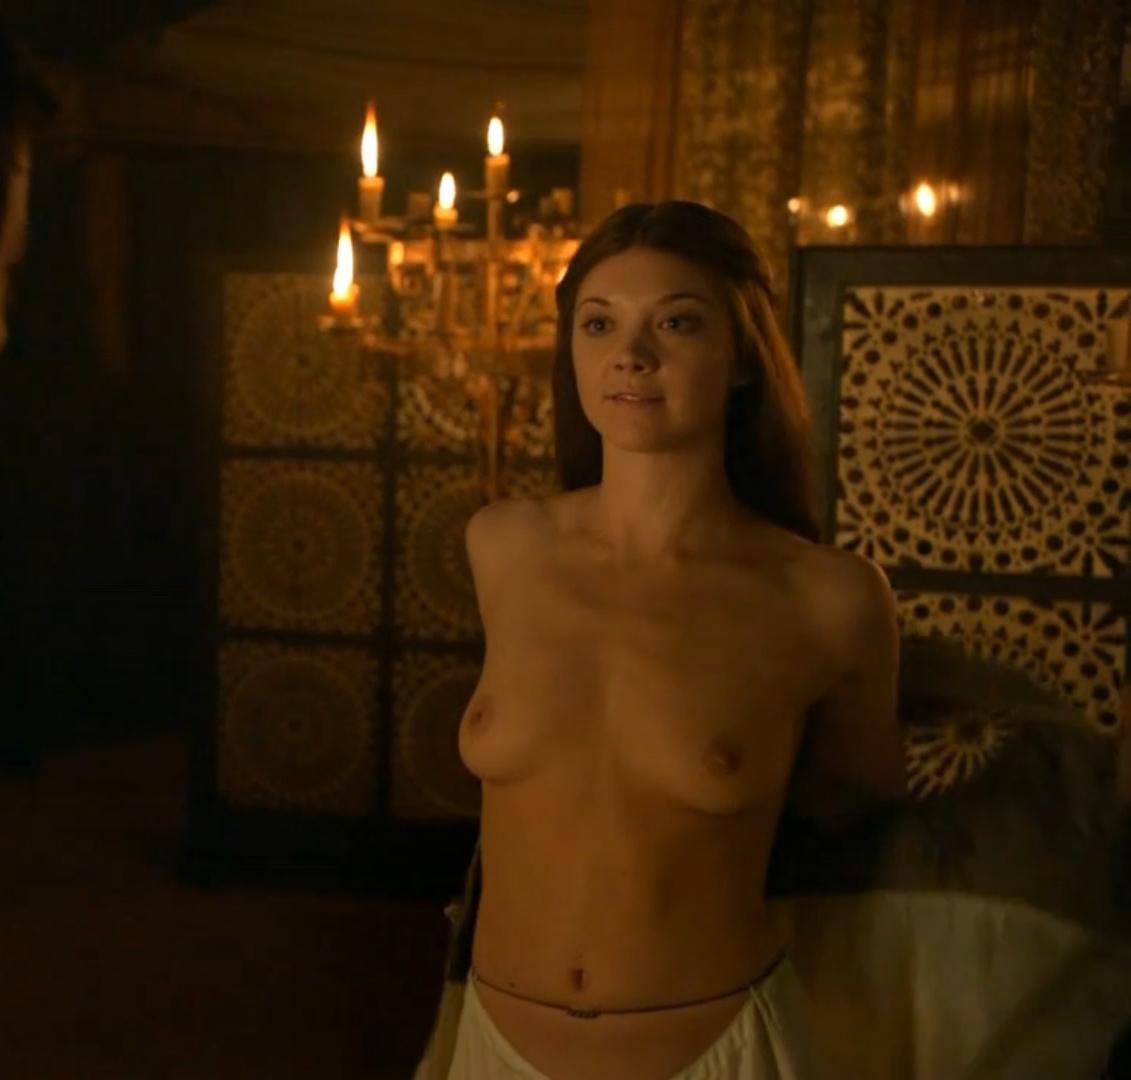 Natalie Dormer Porn+ natalie dormer nude scene in game of thrones series - free video